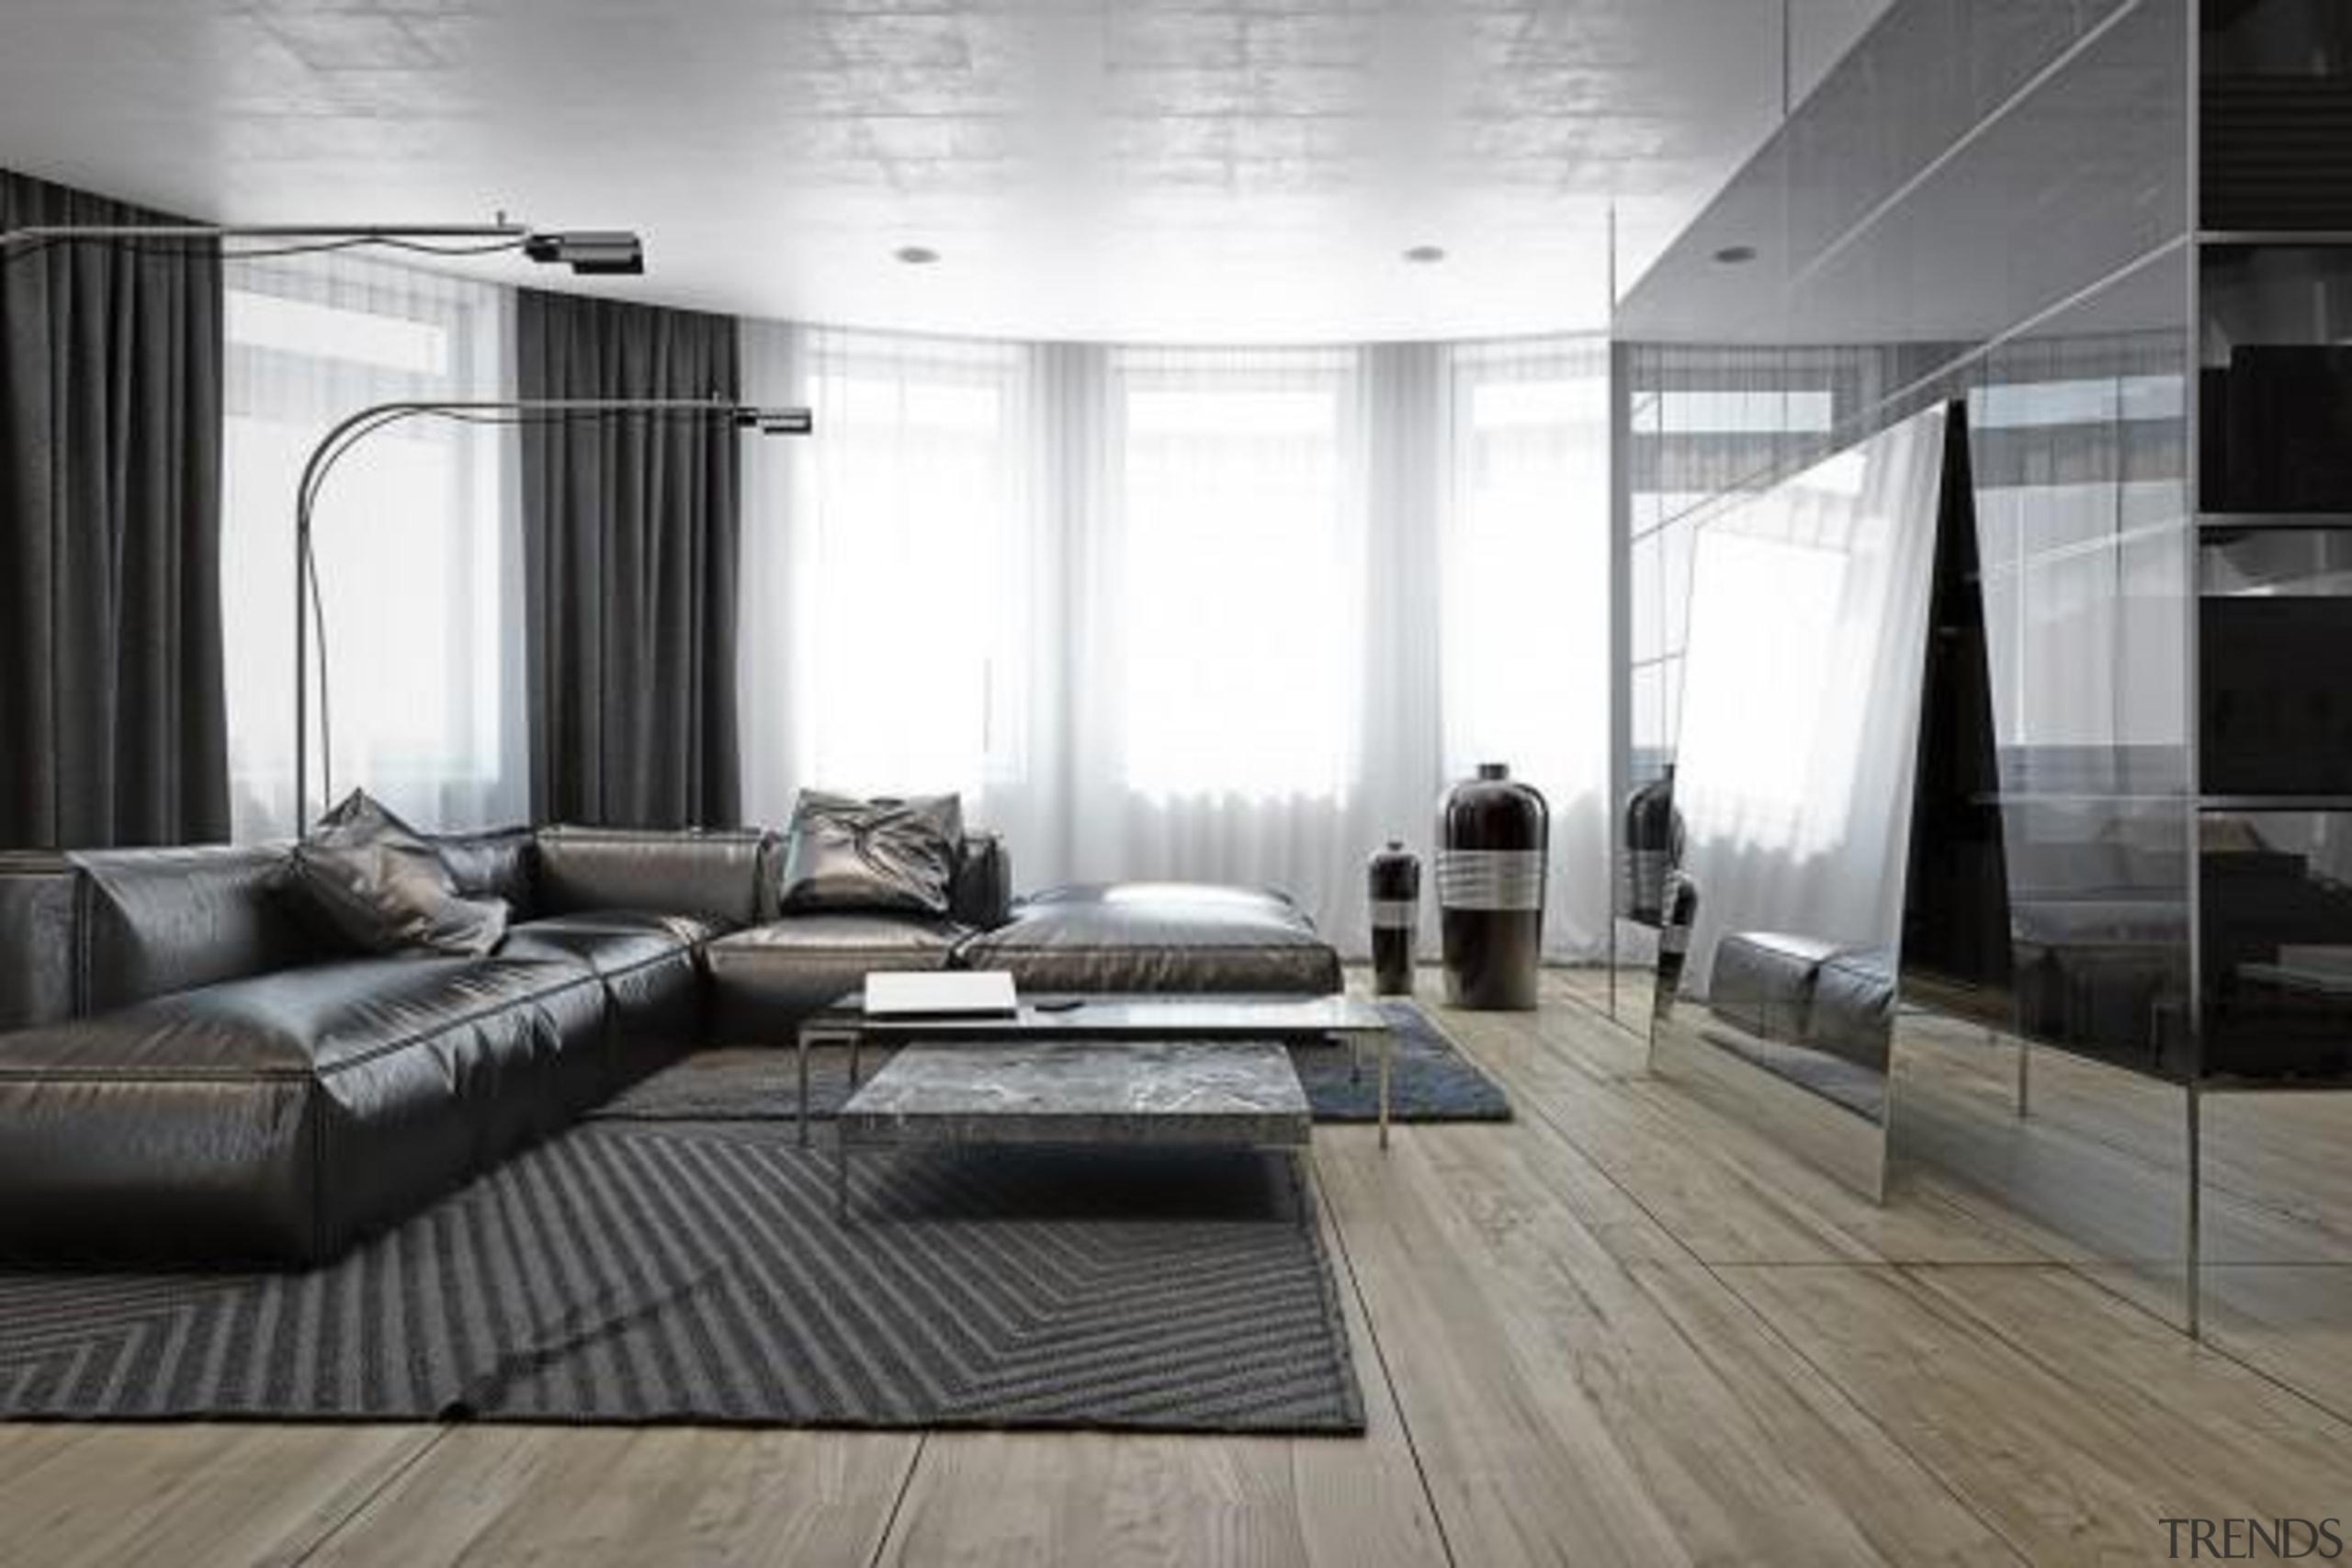 creative coffee table - Masculine Apartments - ceiling ceiling, floor, flooring, furniture, interior design, living room, room, wall, window, wood flooring, gray, white, black